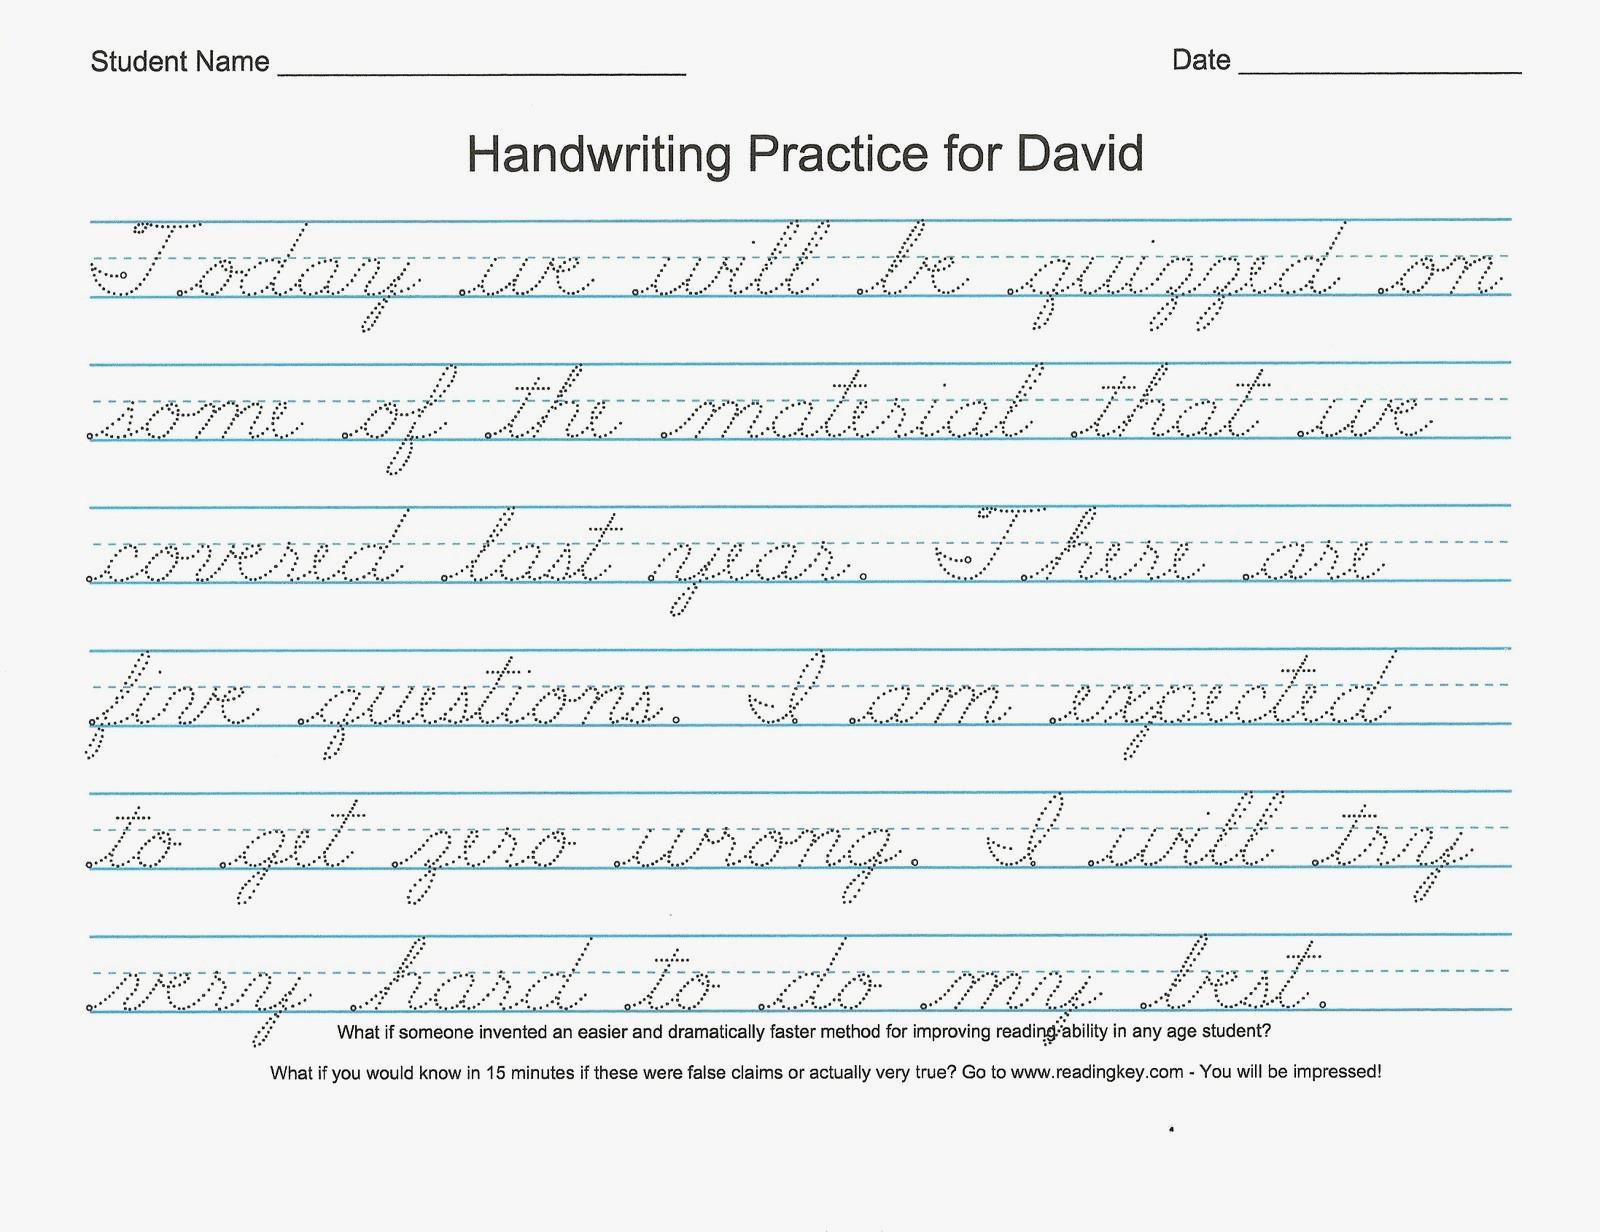 54 Unique Of Free Printable Cursive Handwriting Worksheets Pic | Cursive Handwriting Worksheets Ks1 Printable